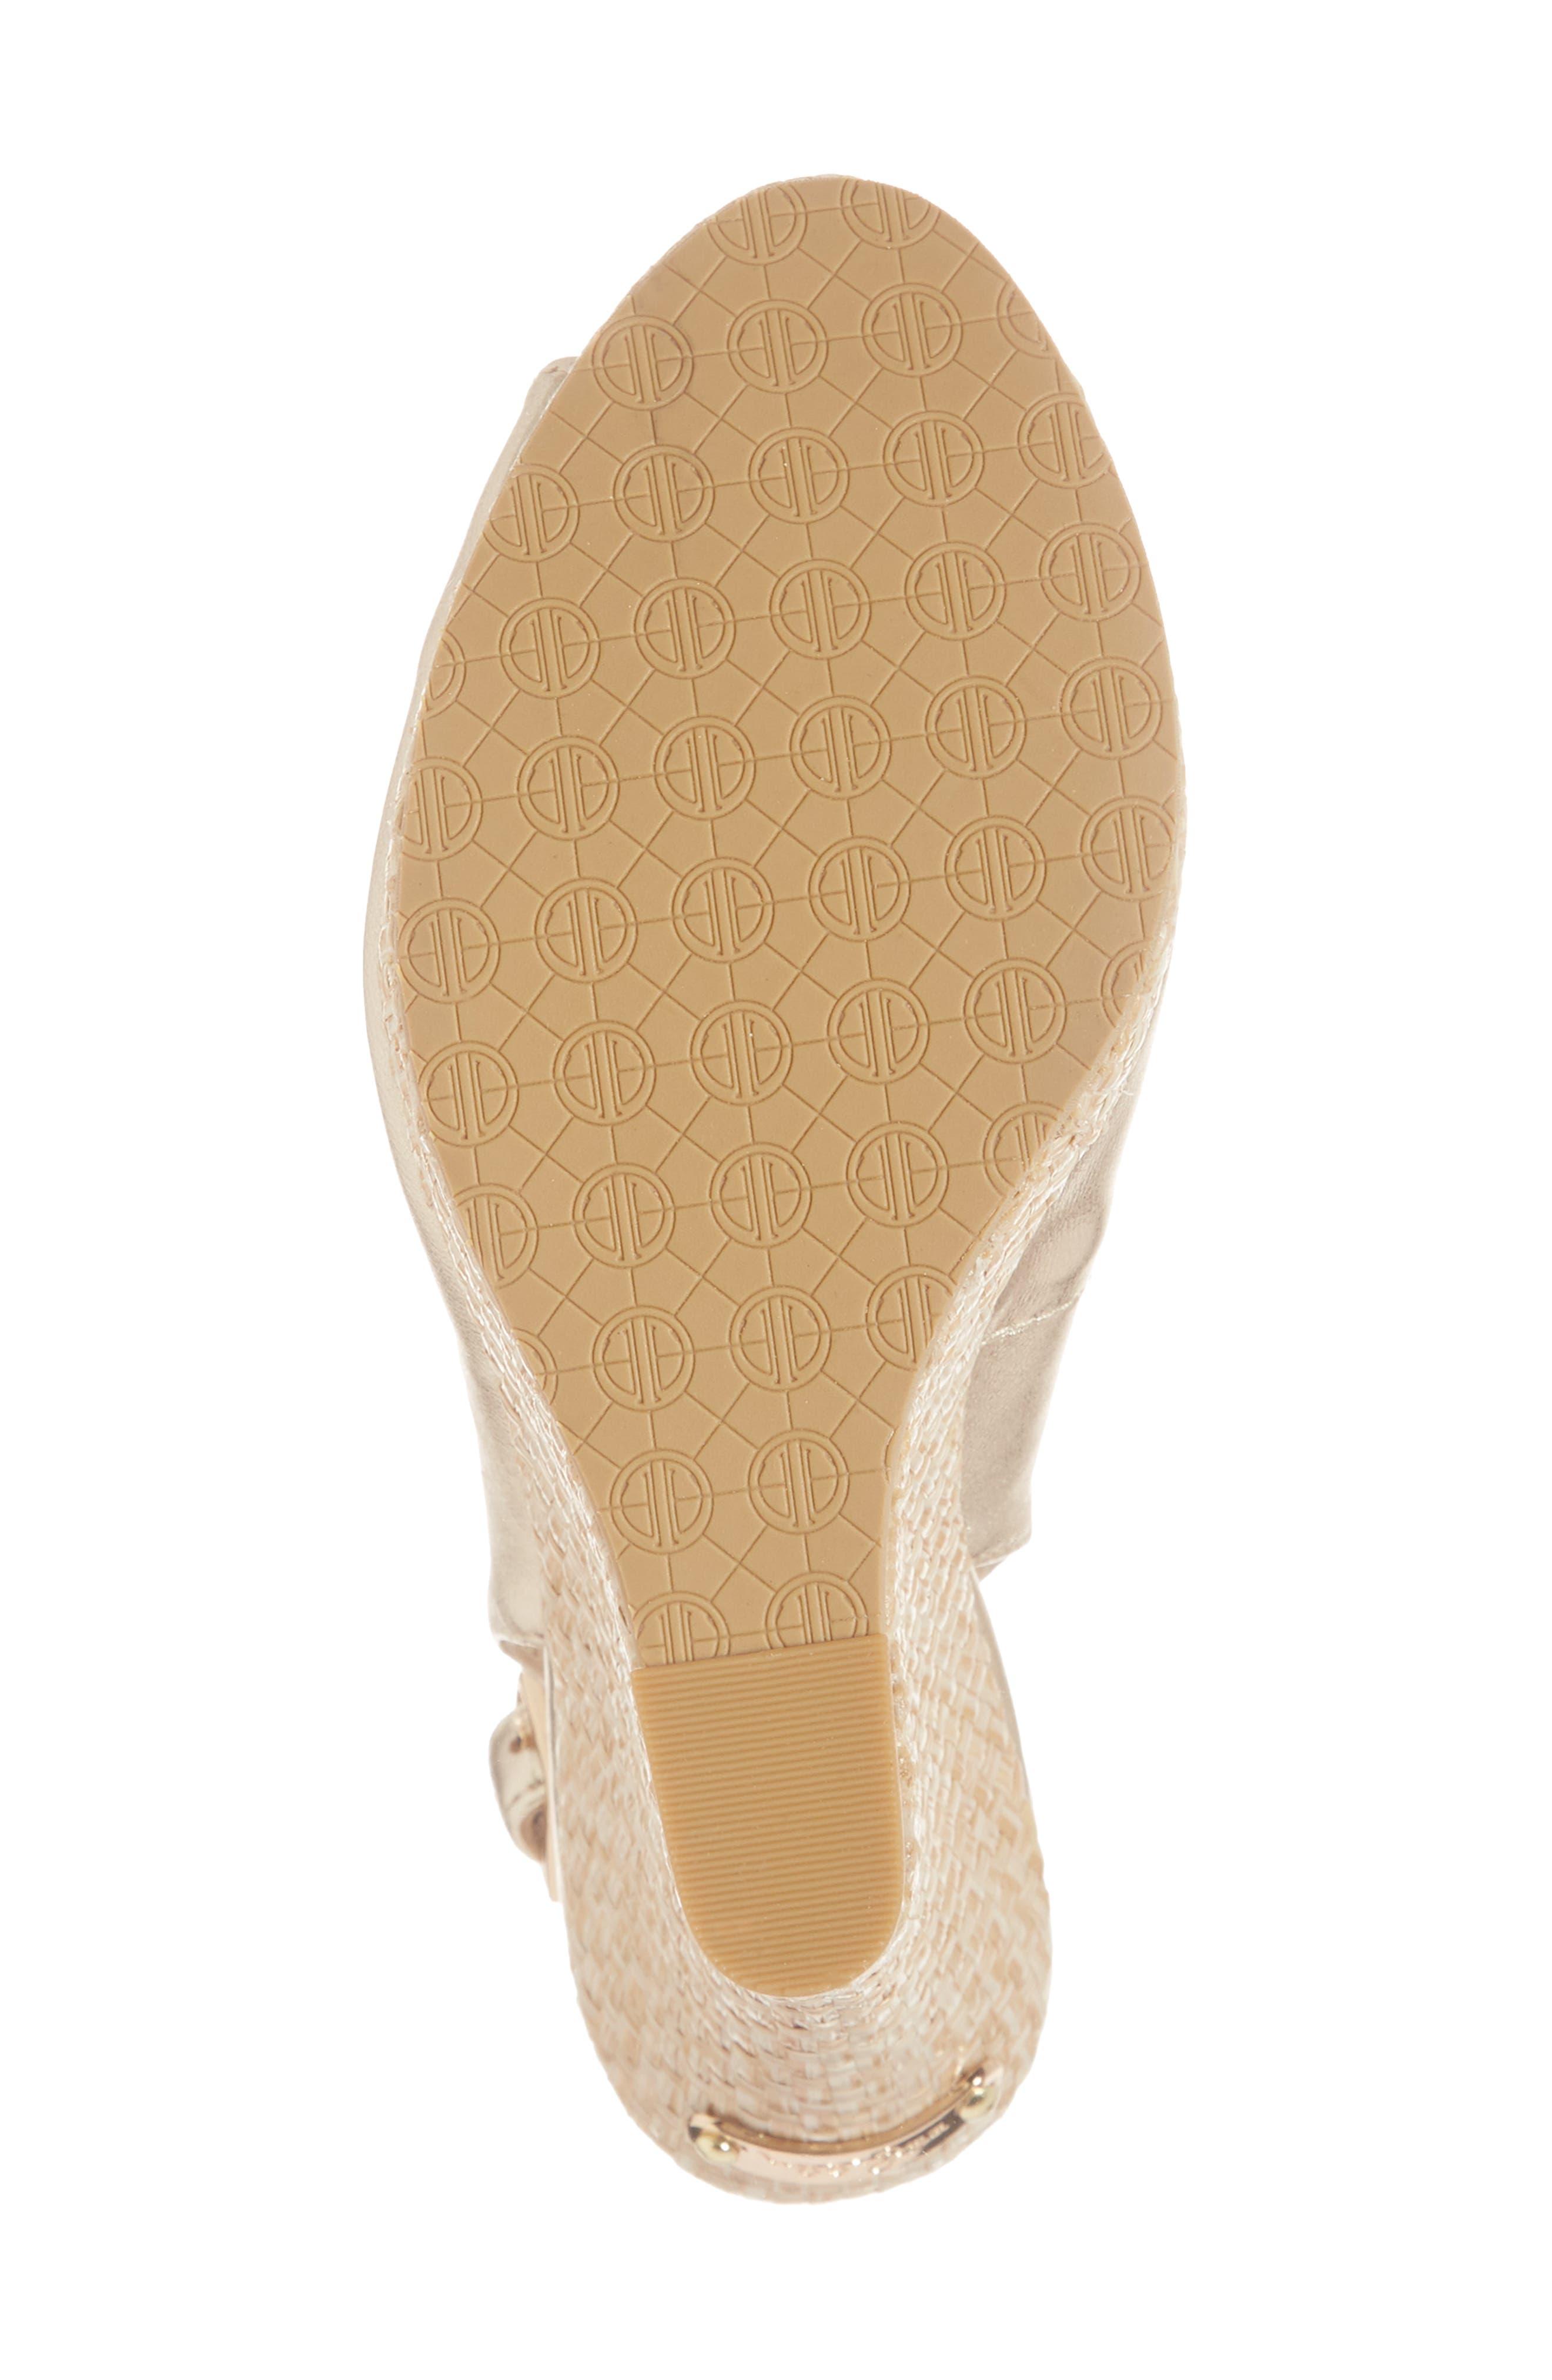 Kristin Slingback Wedge Sandal,                             Alternate thumbnail 6, color,                             GOLD METALLIC LEATHER